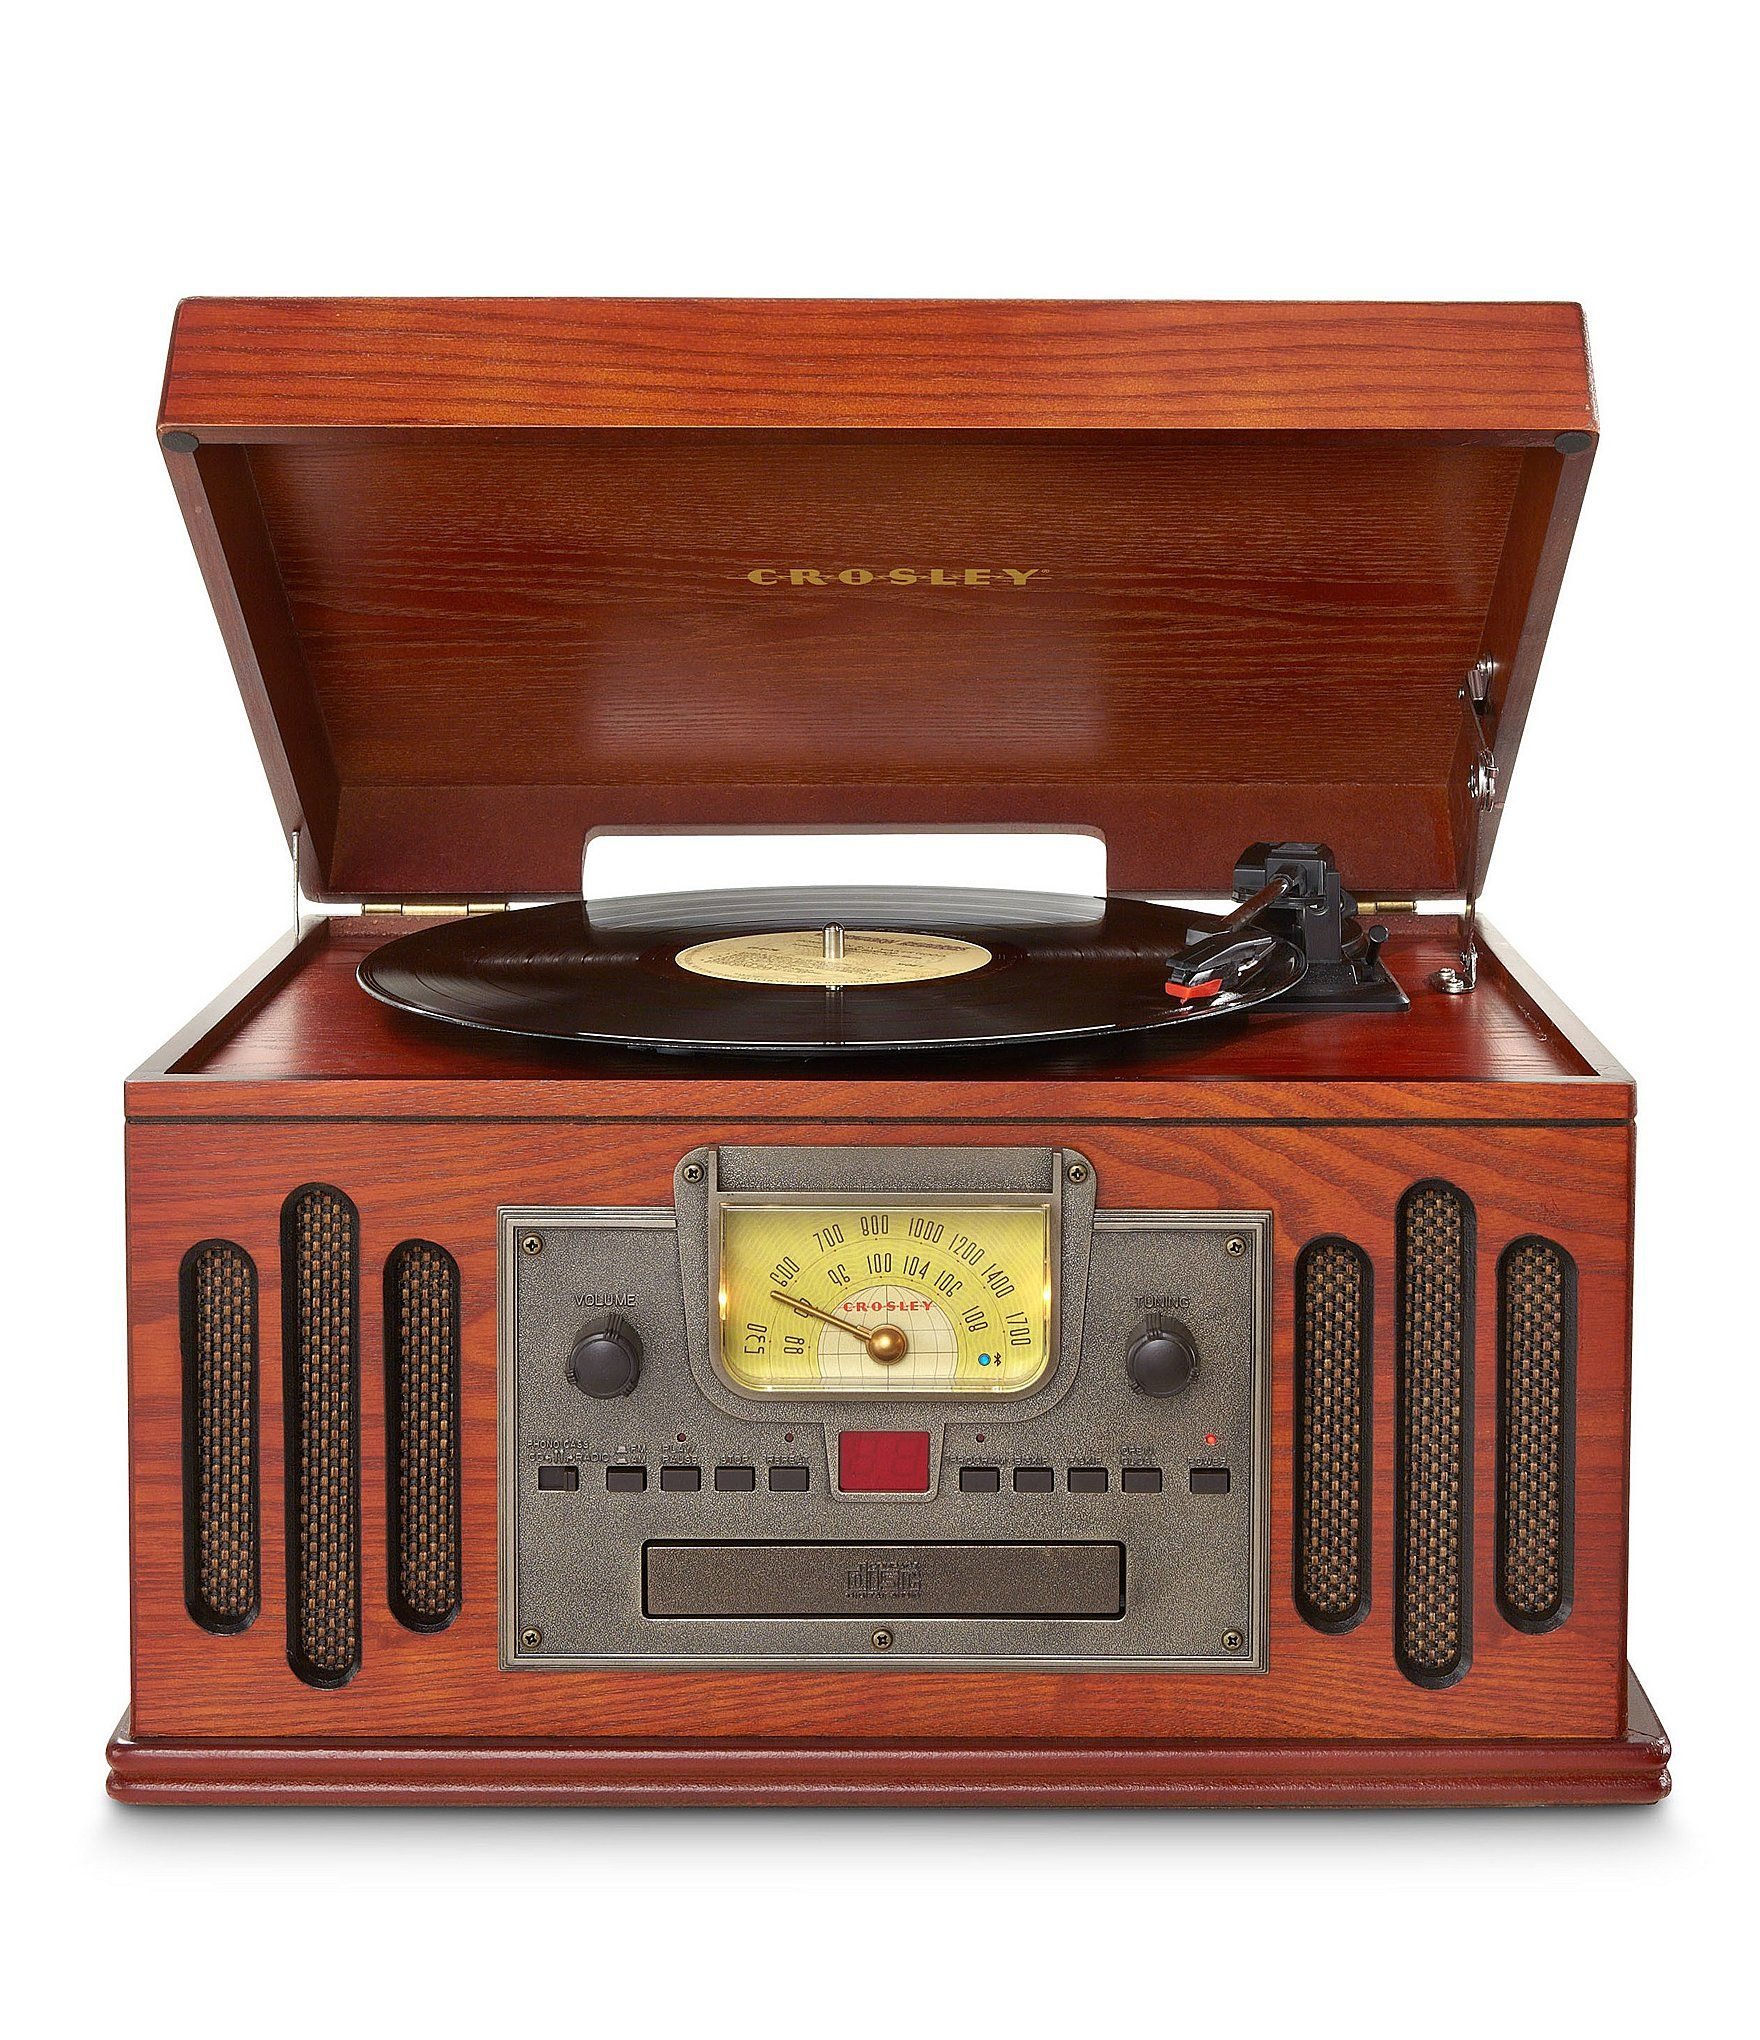 Crosley Musician Turntable Dillard S In 2020 Turntable Crosley Radio Wooden Record Player